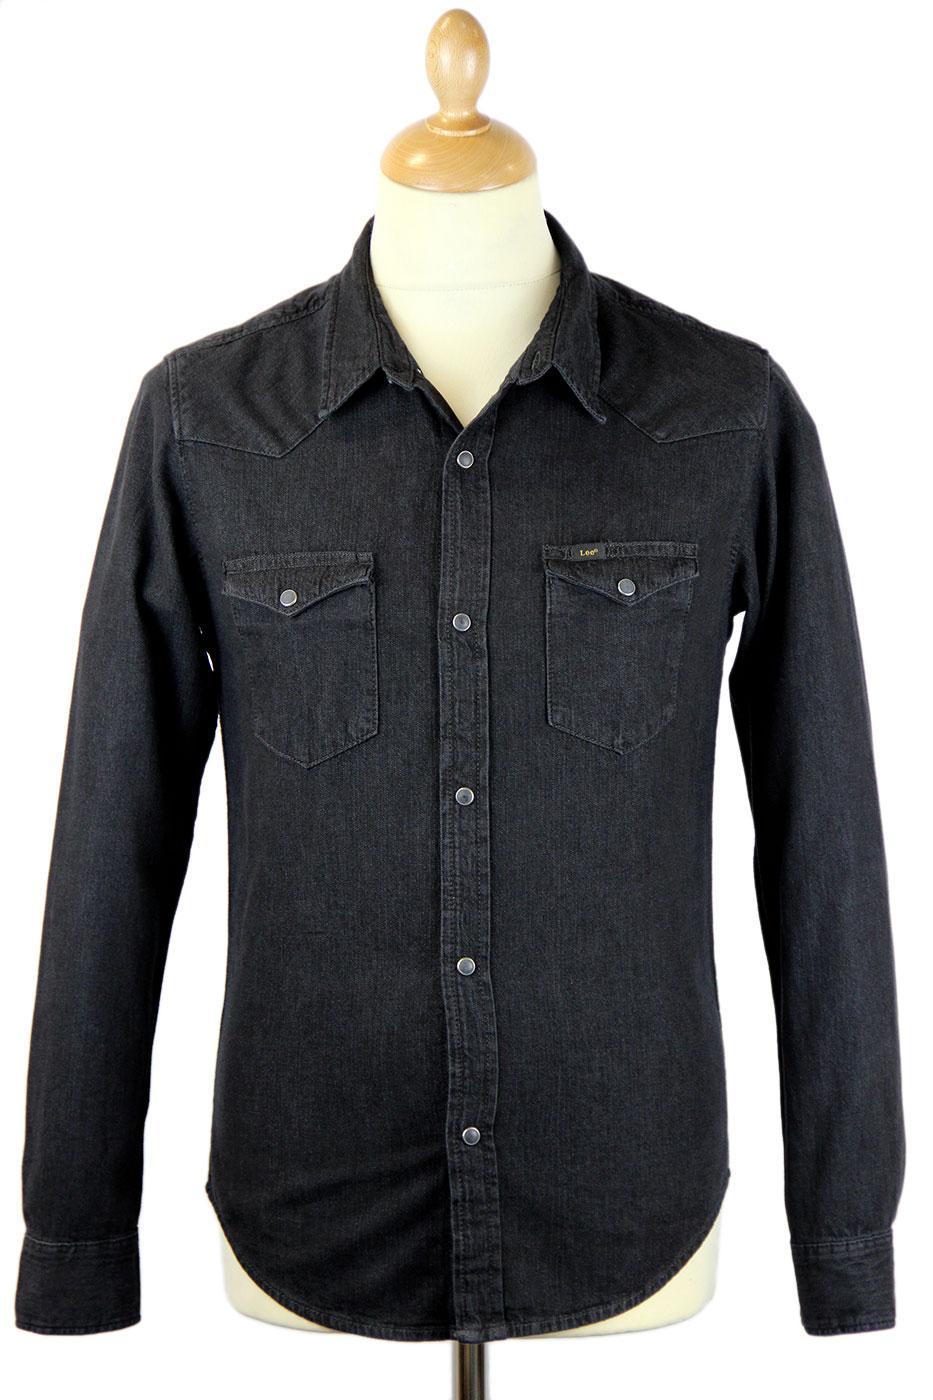 LEE Slim Fit Retro Indie Mod Denim Western Shirt Pitch Black